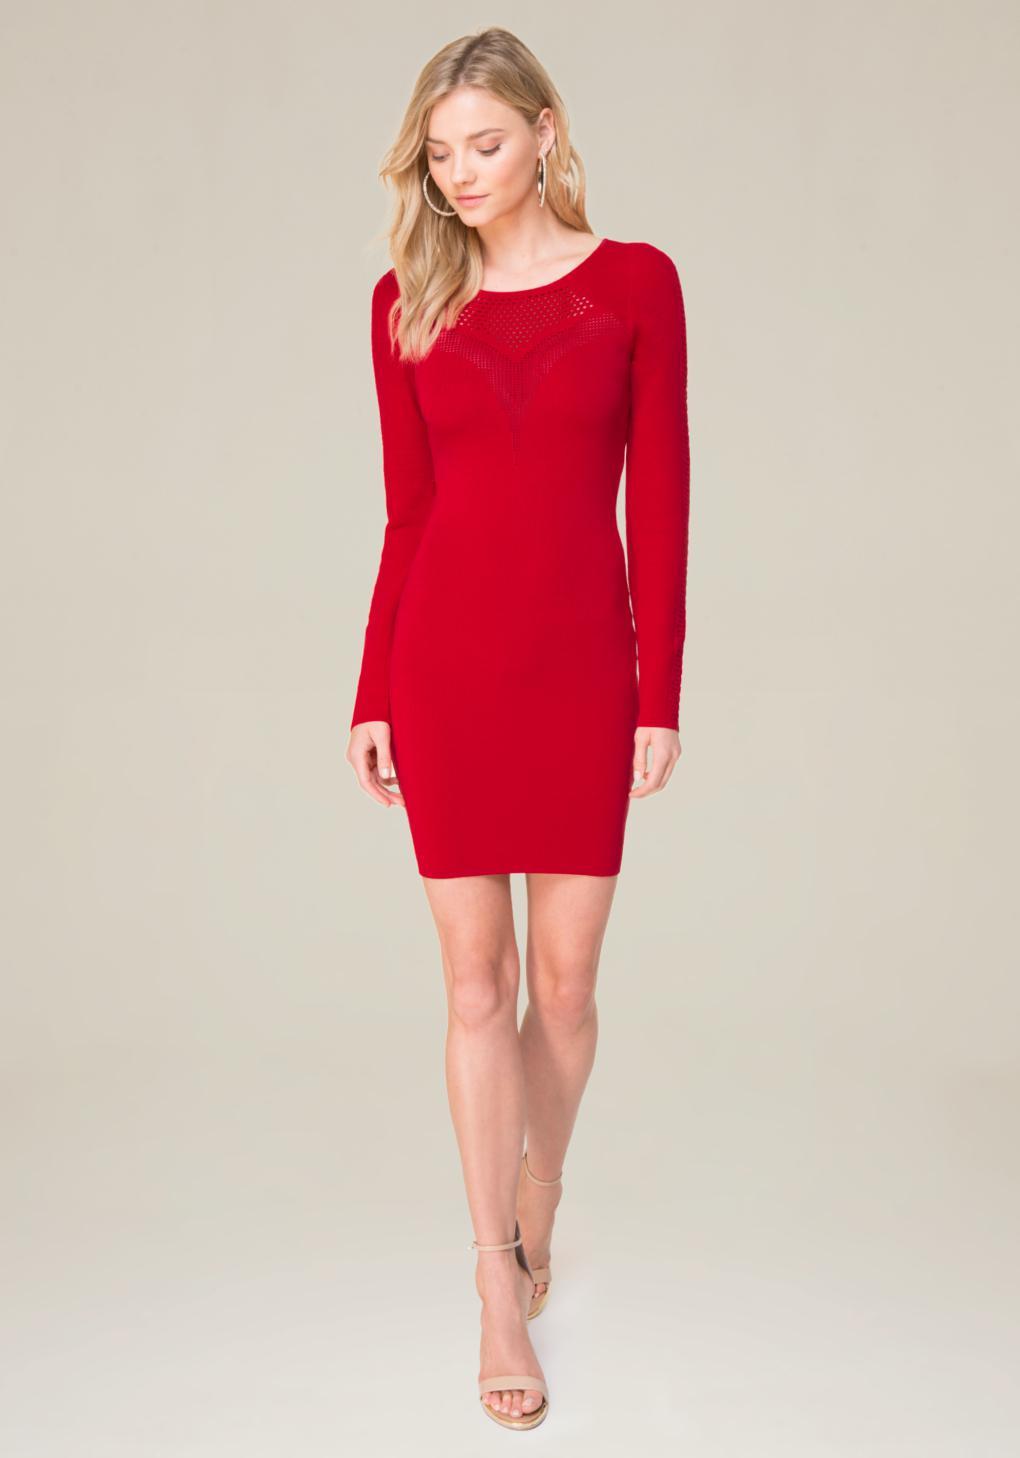 lyst bebe crochet inset dress in red. Black Bedroom Furniture Sets. Home Design Ideas